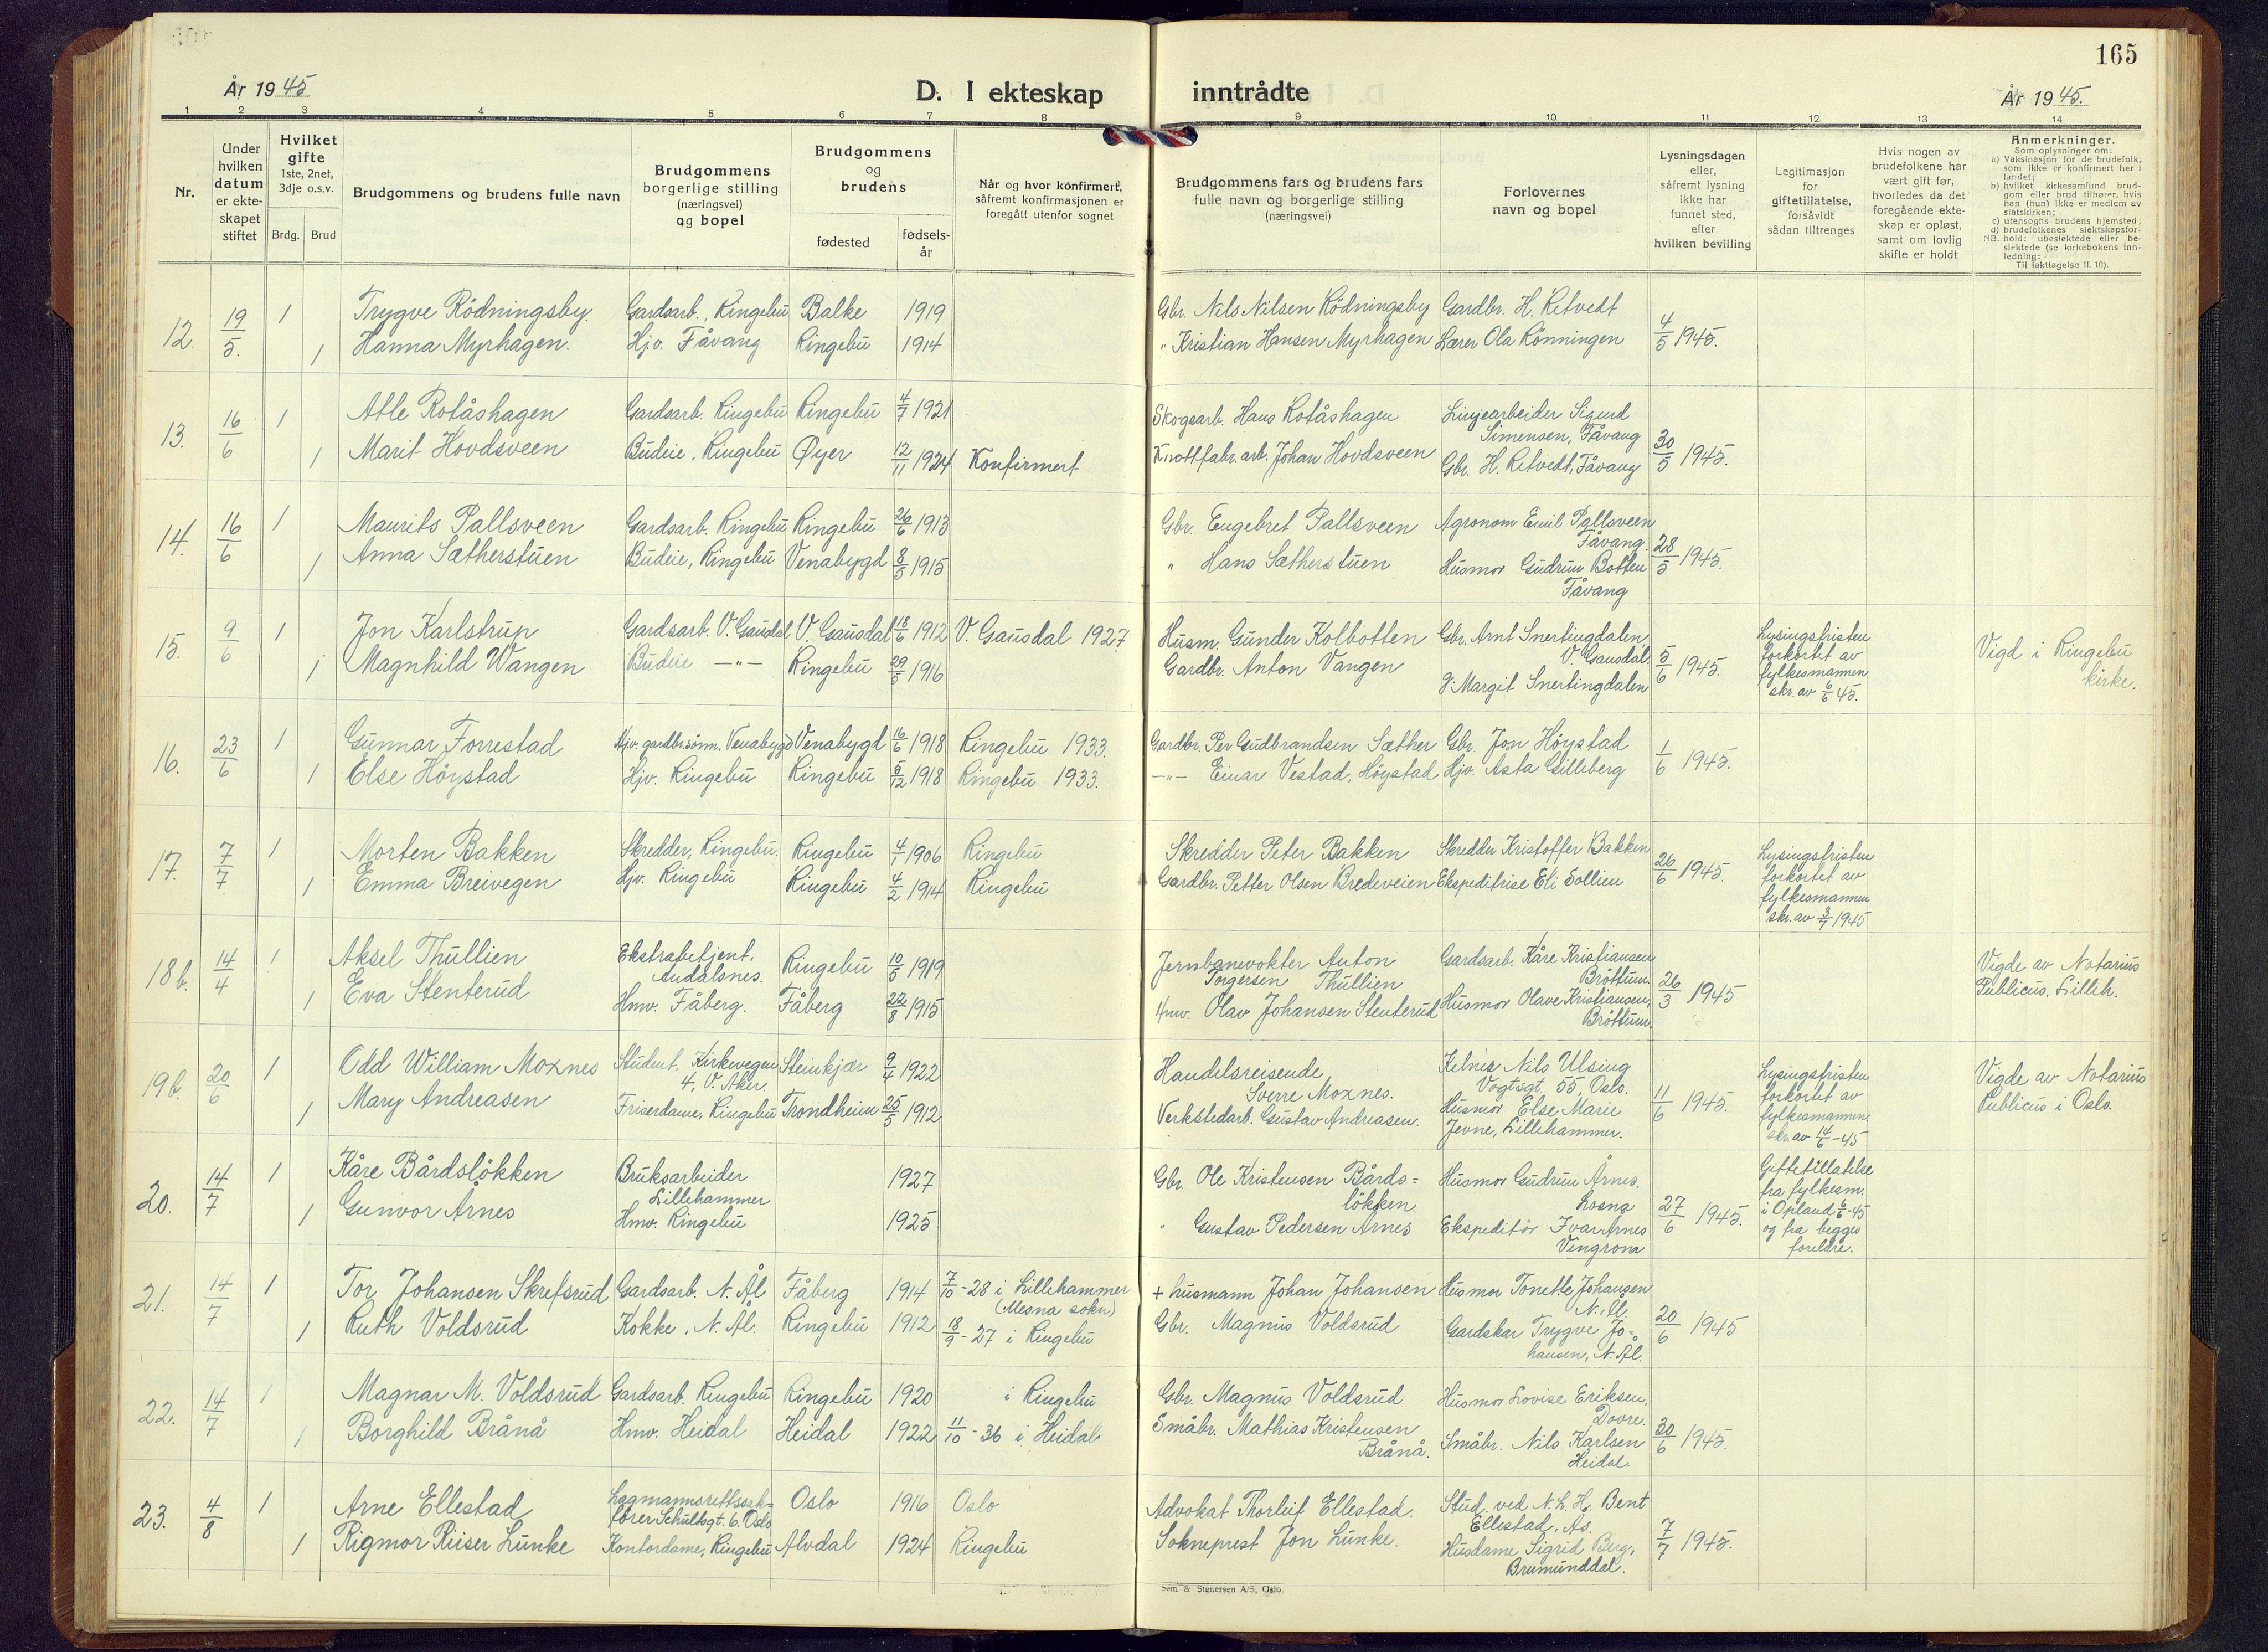 SAH, Ringebu prestekontor, Klokkerbok nr. 13, 1943-1956, s. 165